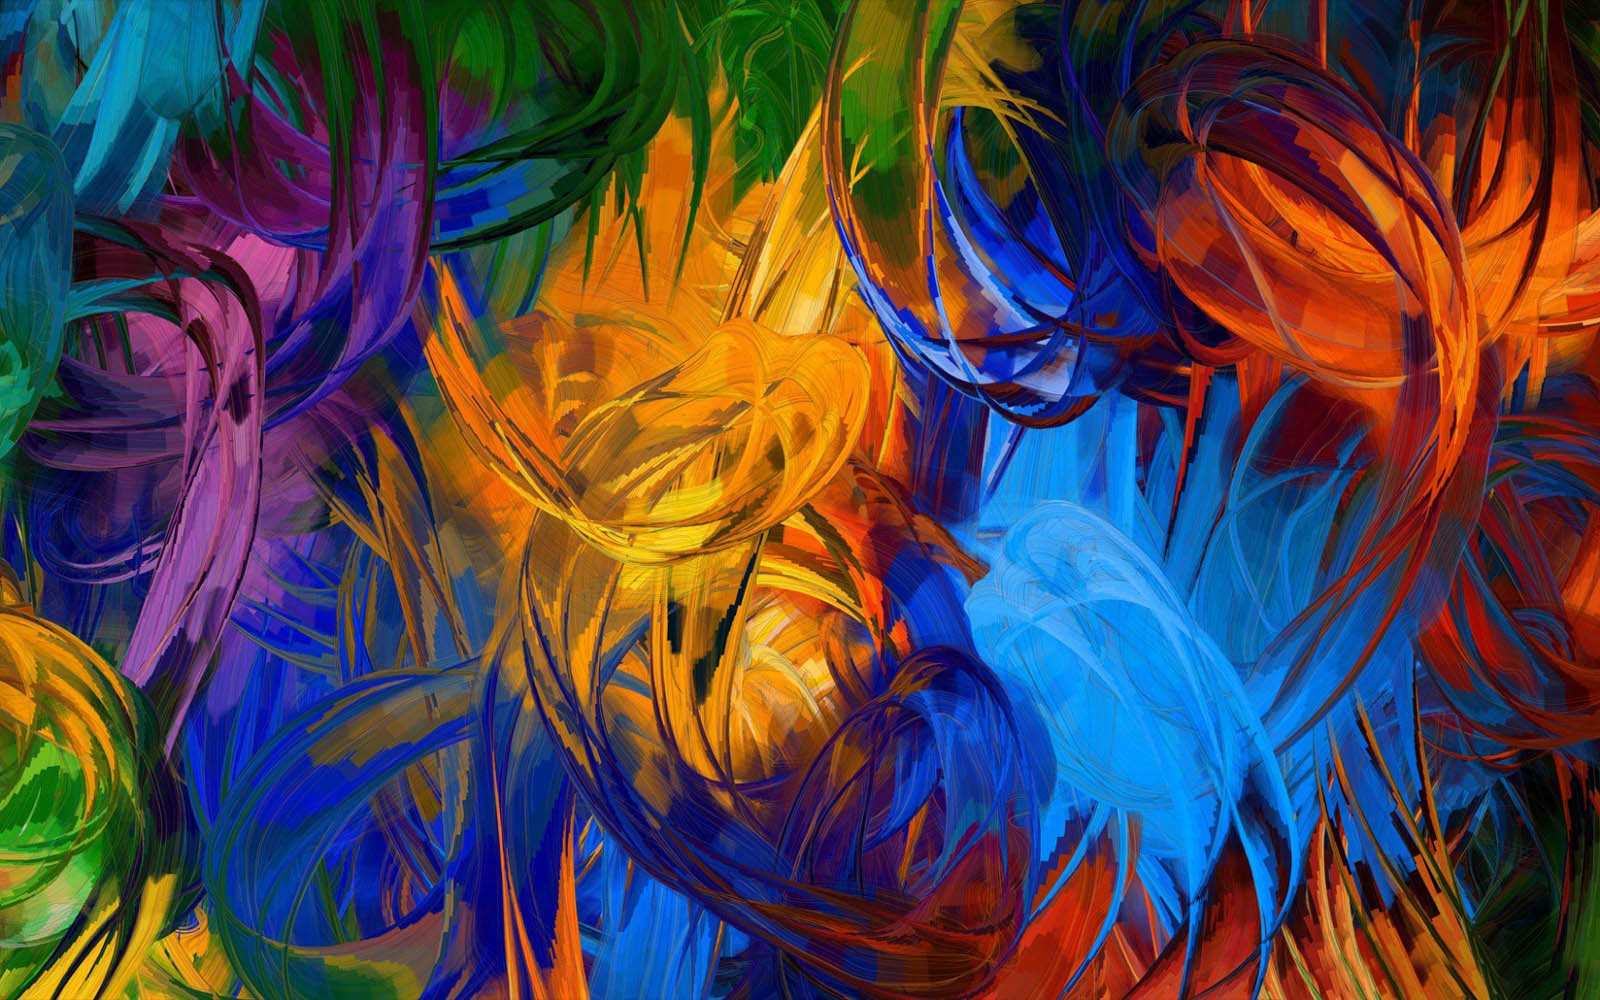 76 ] Wallpaper Abstract Art On WallpaperSafari